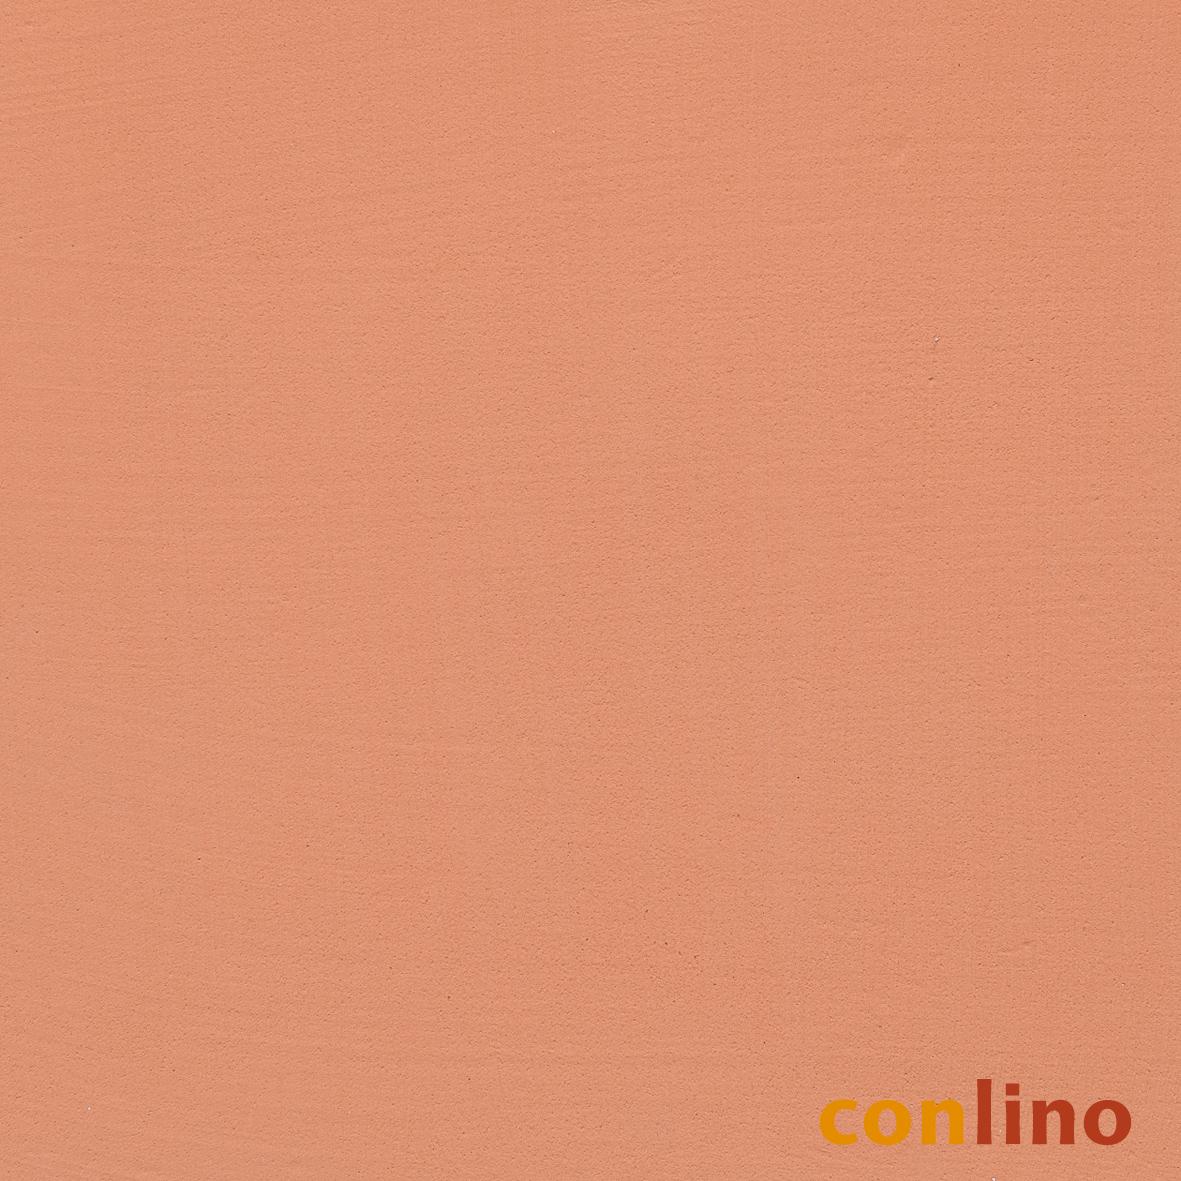 conluto Lehmfarbe Siena CL 122